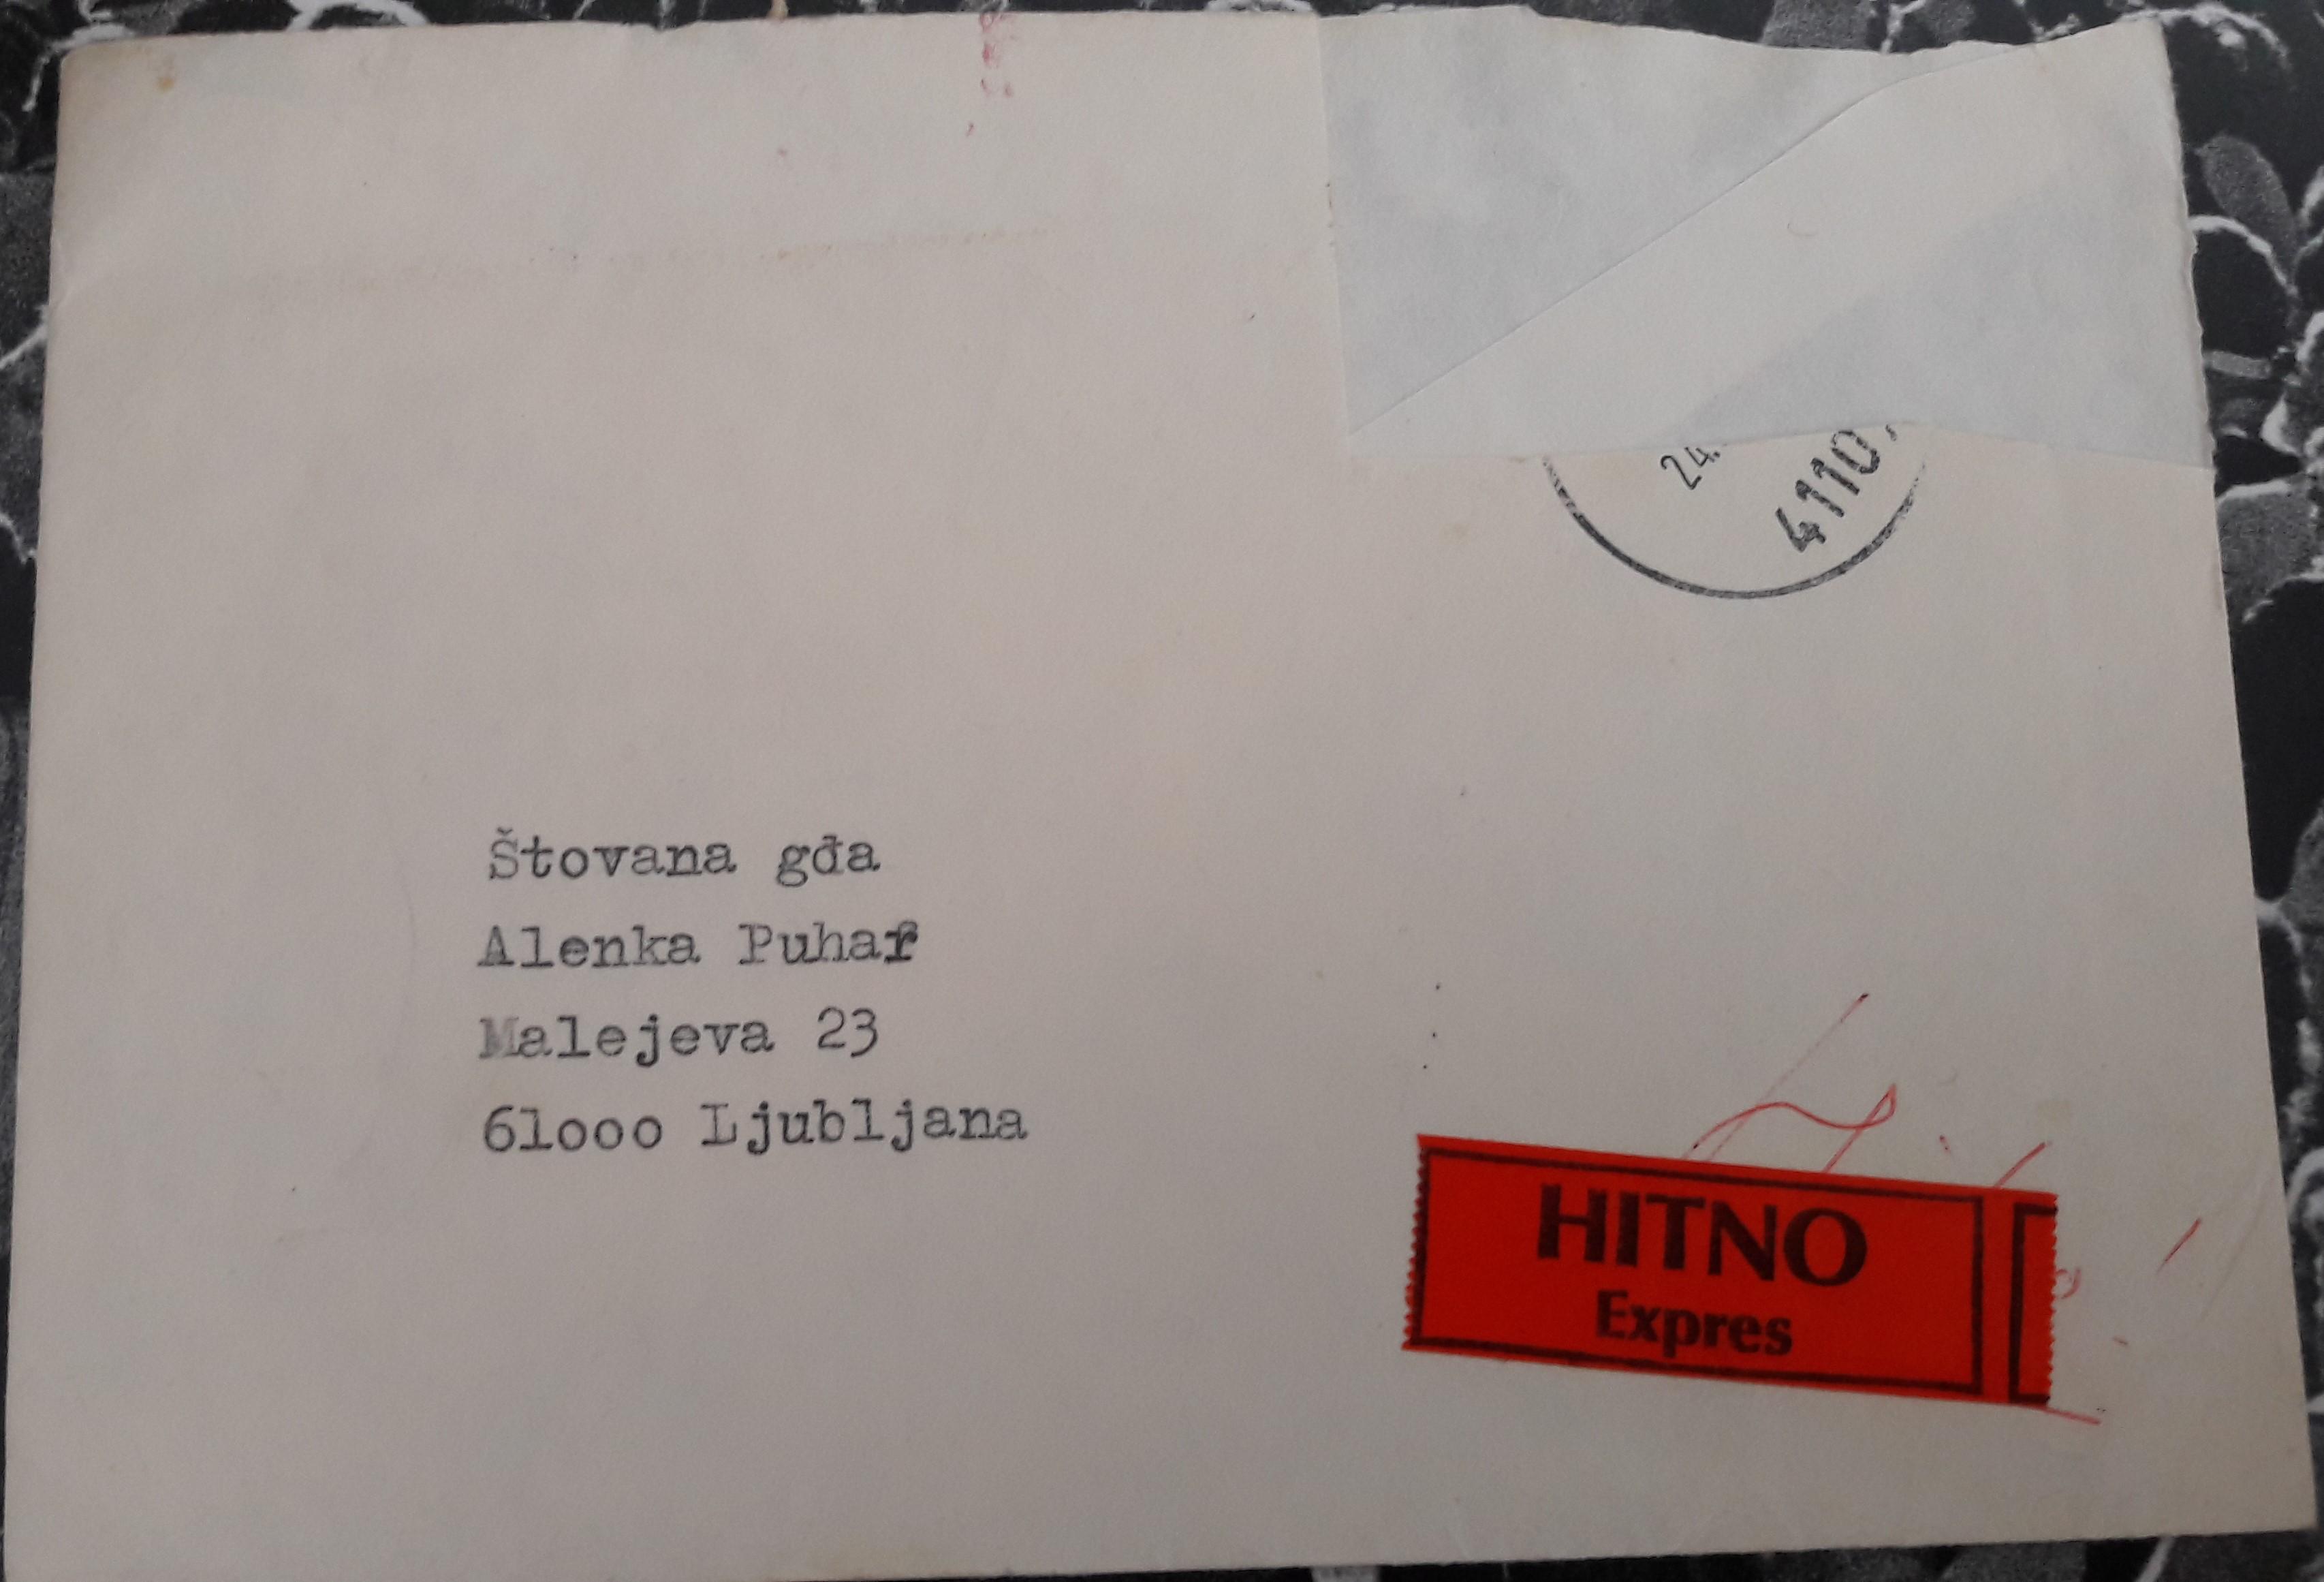 Letter from Dobroslav Paraga to Alenka Puhar.